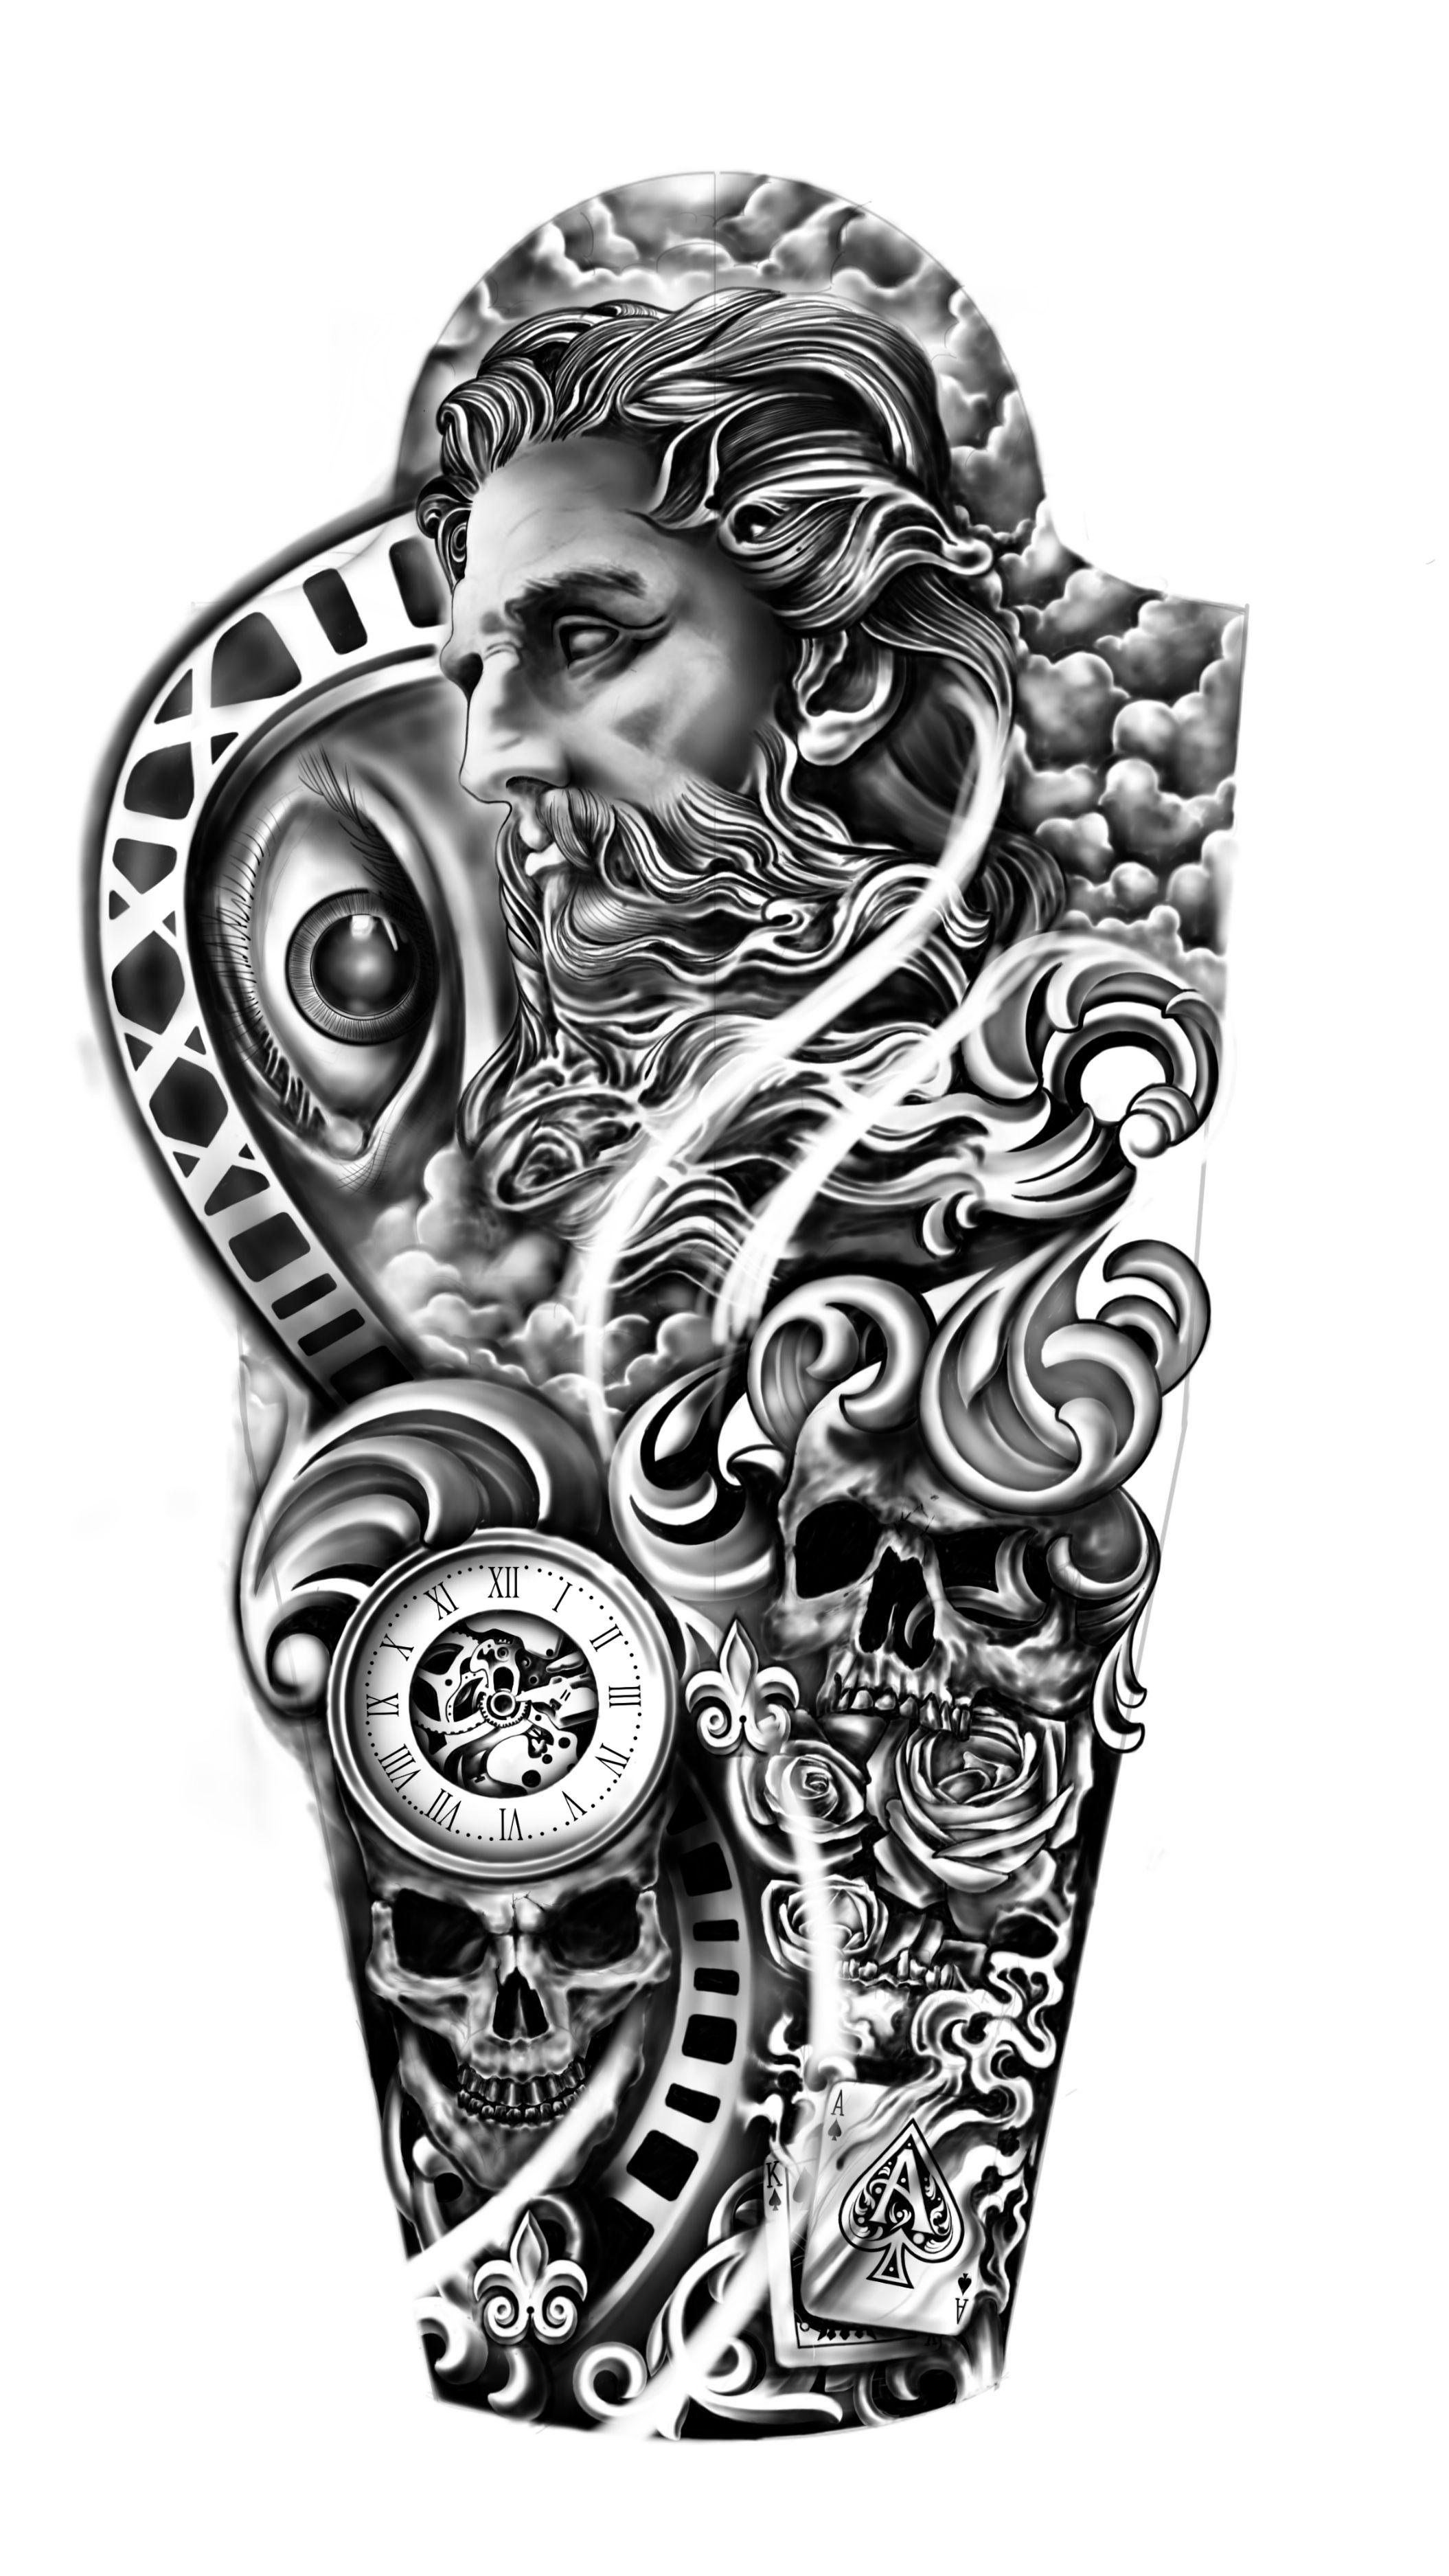 Greek God Zeus Full sleeve tattoo Personal Design Created By Michael Custom Tattoo | Designhill